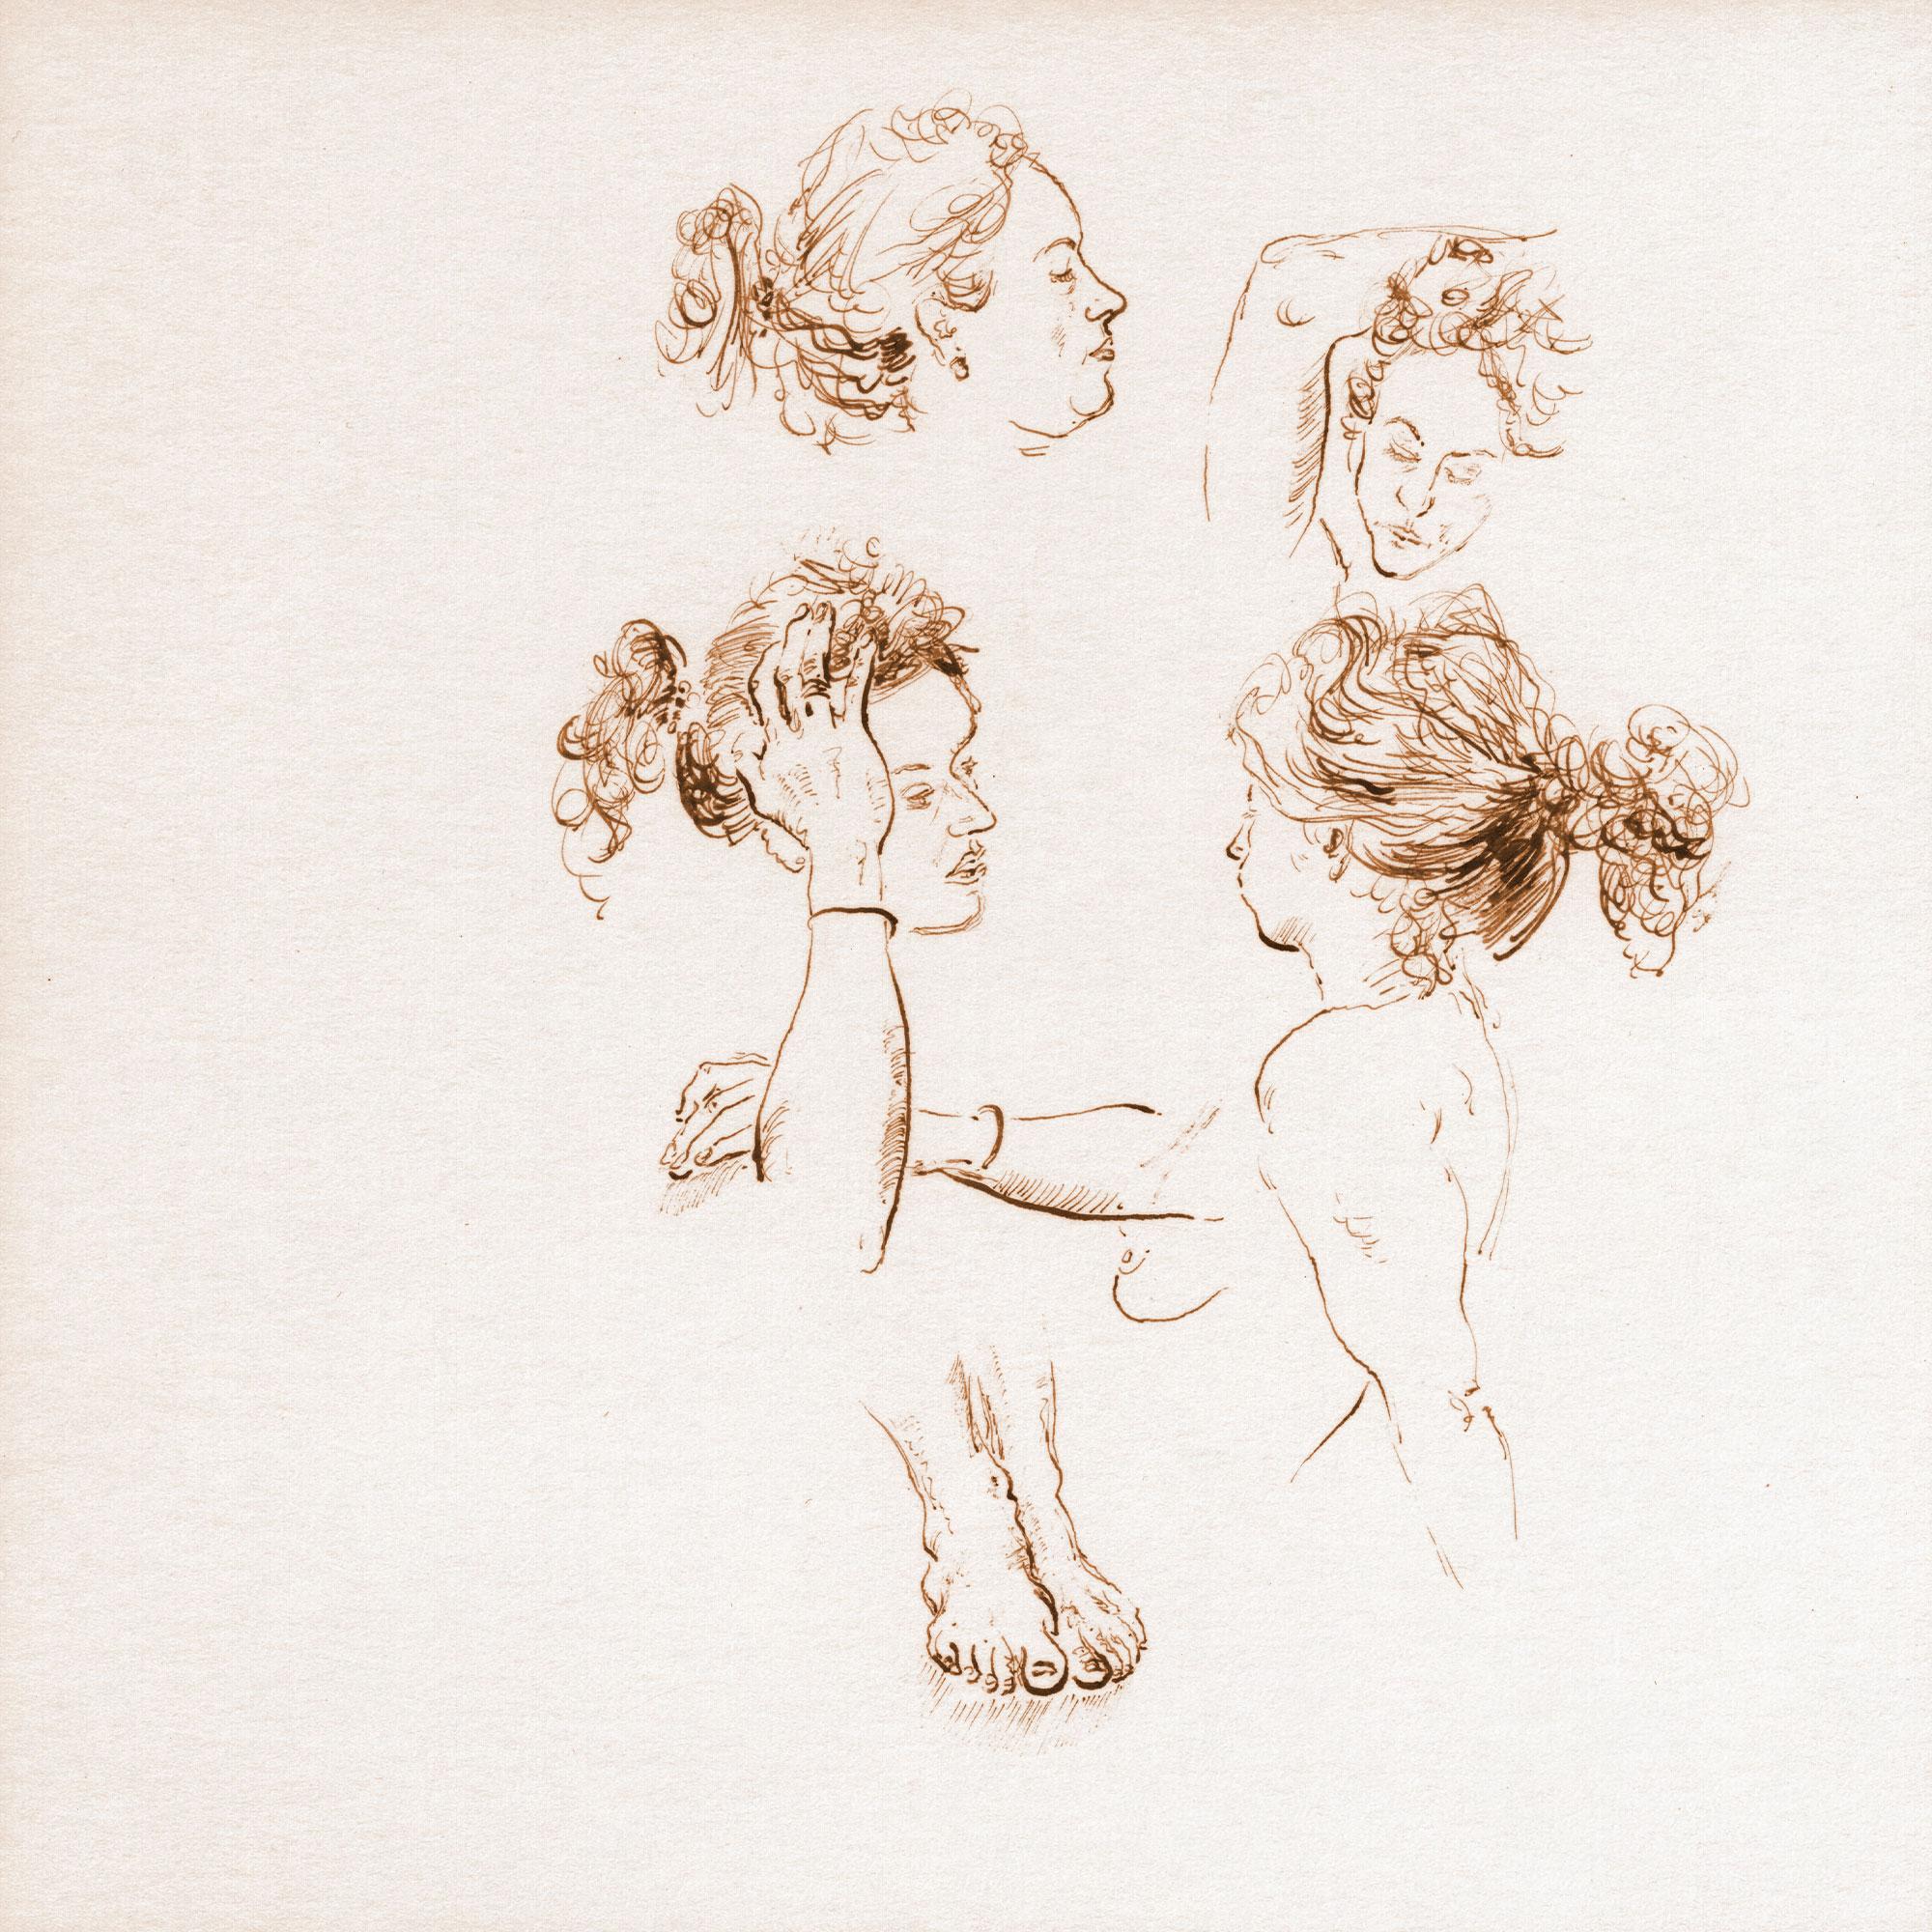 Sarah Lena head studies 1